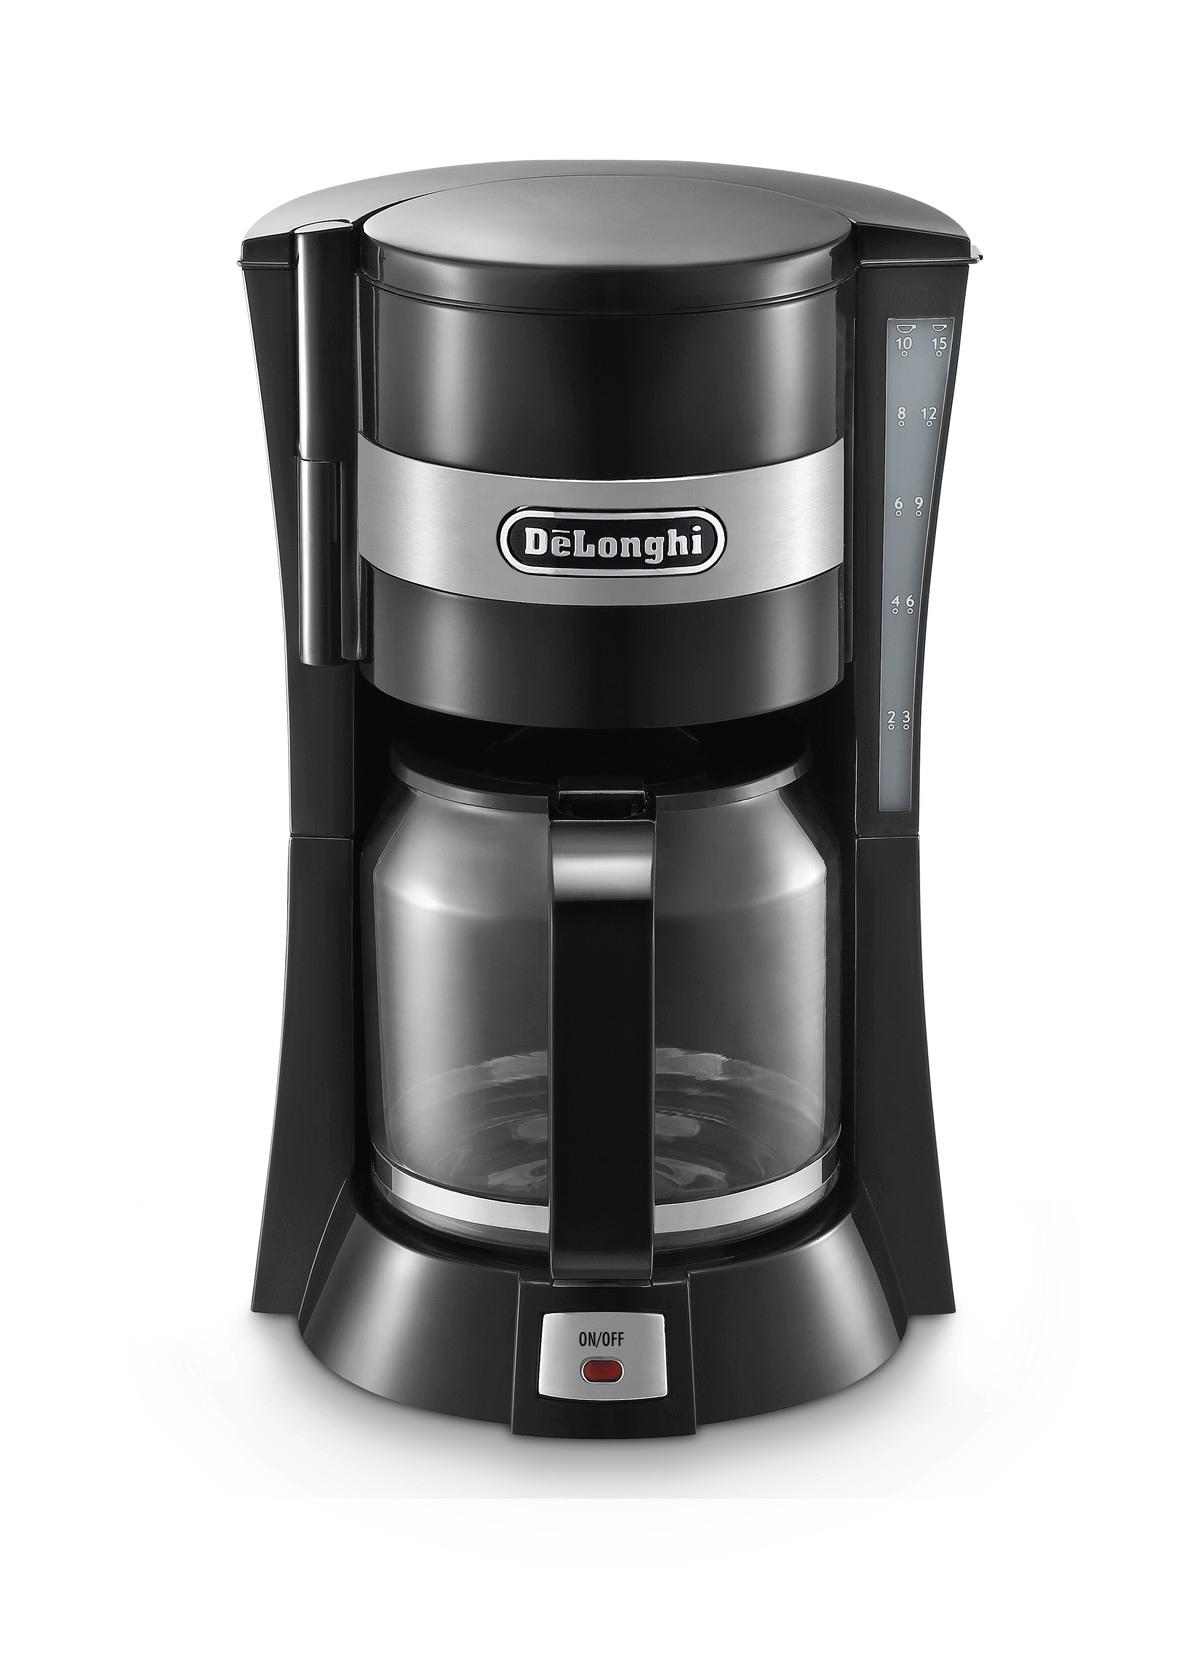 DeLonghi Active Line filterkaffemaskine, sort